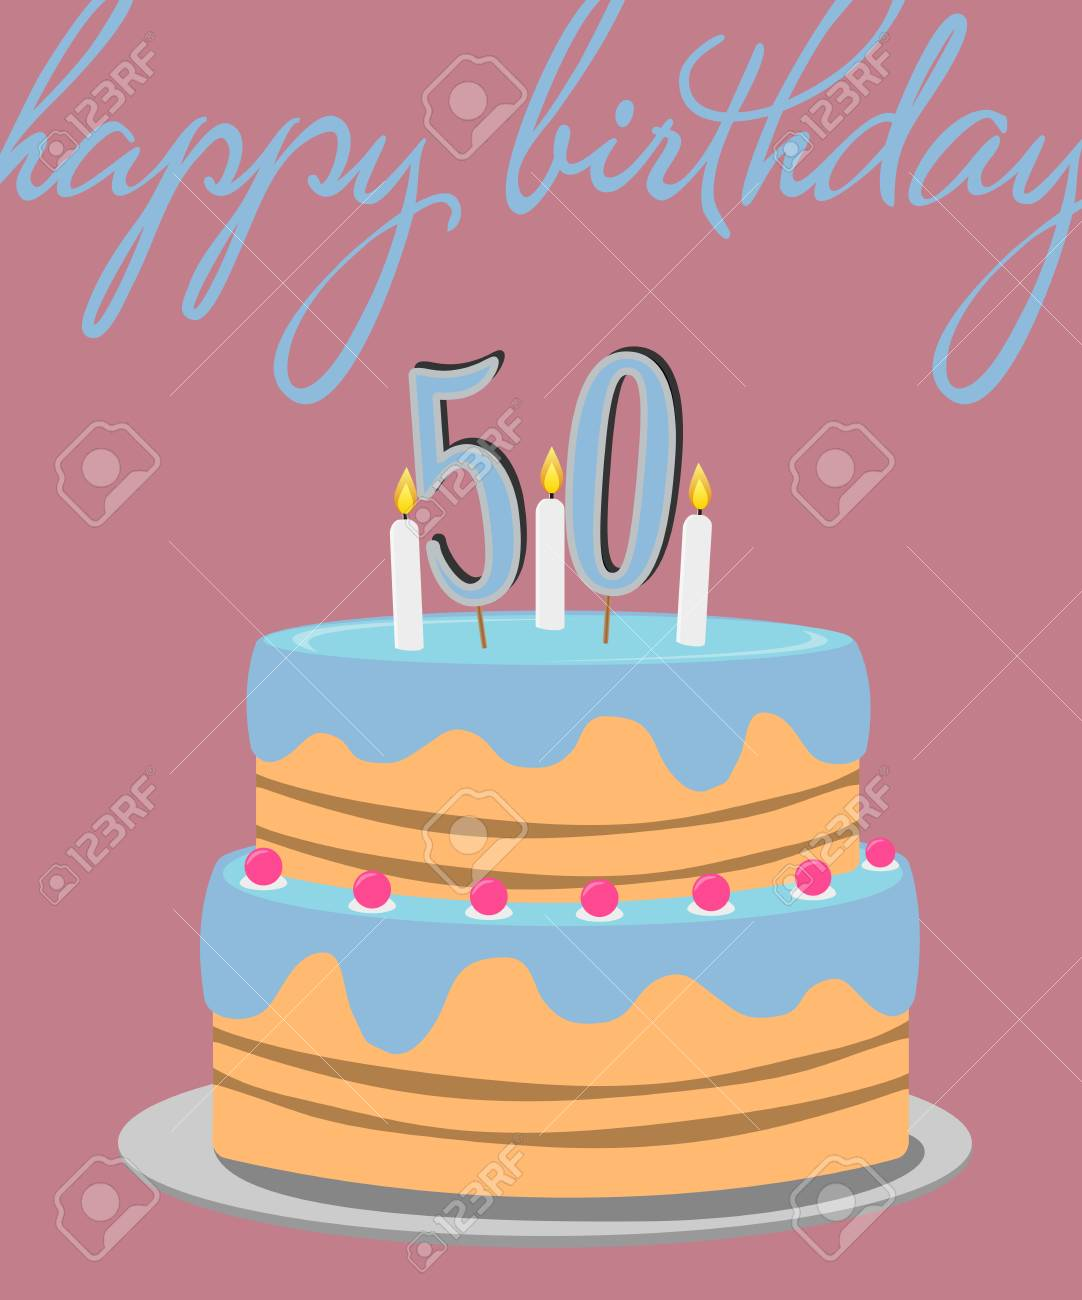 Awe Inspiring Happy 50Th Birthday Greeting Card With Colorful Birthday Cake Personalised Birthday Cards Veneteletsinfo